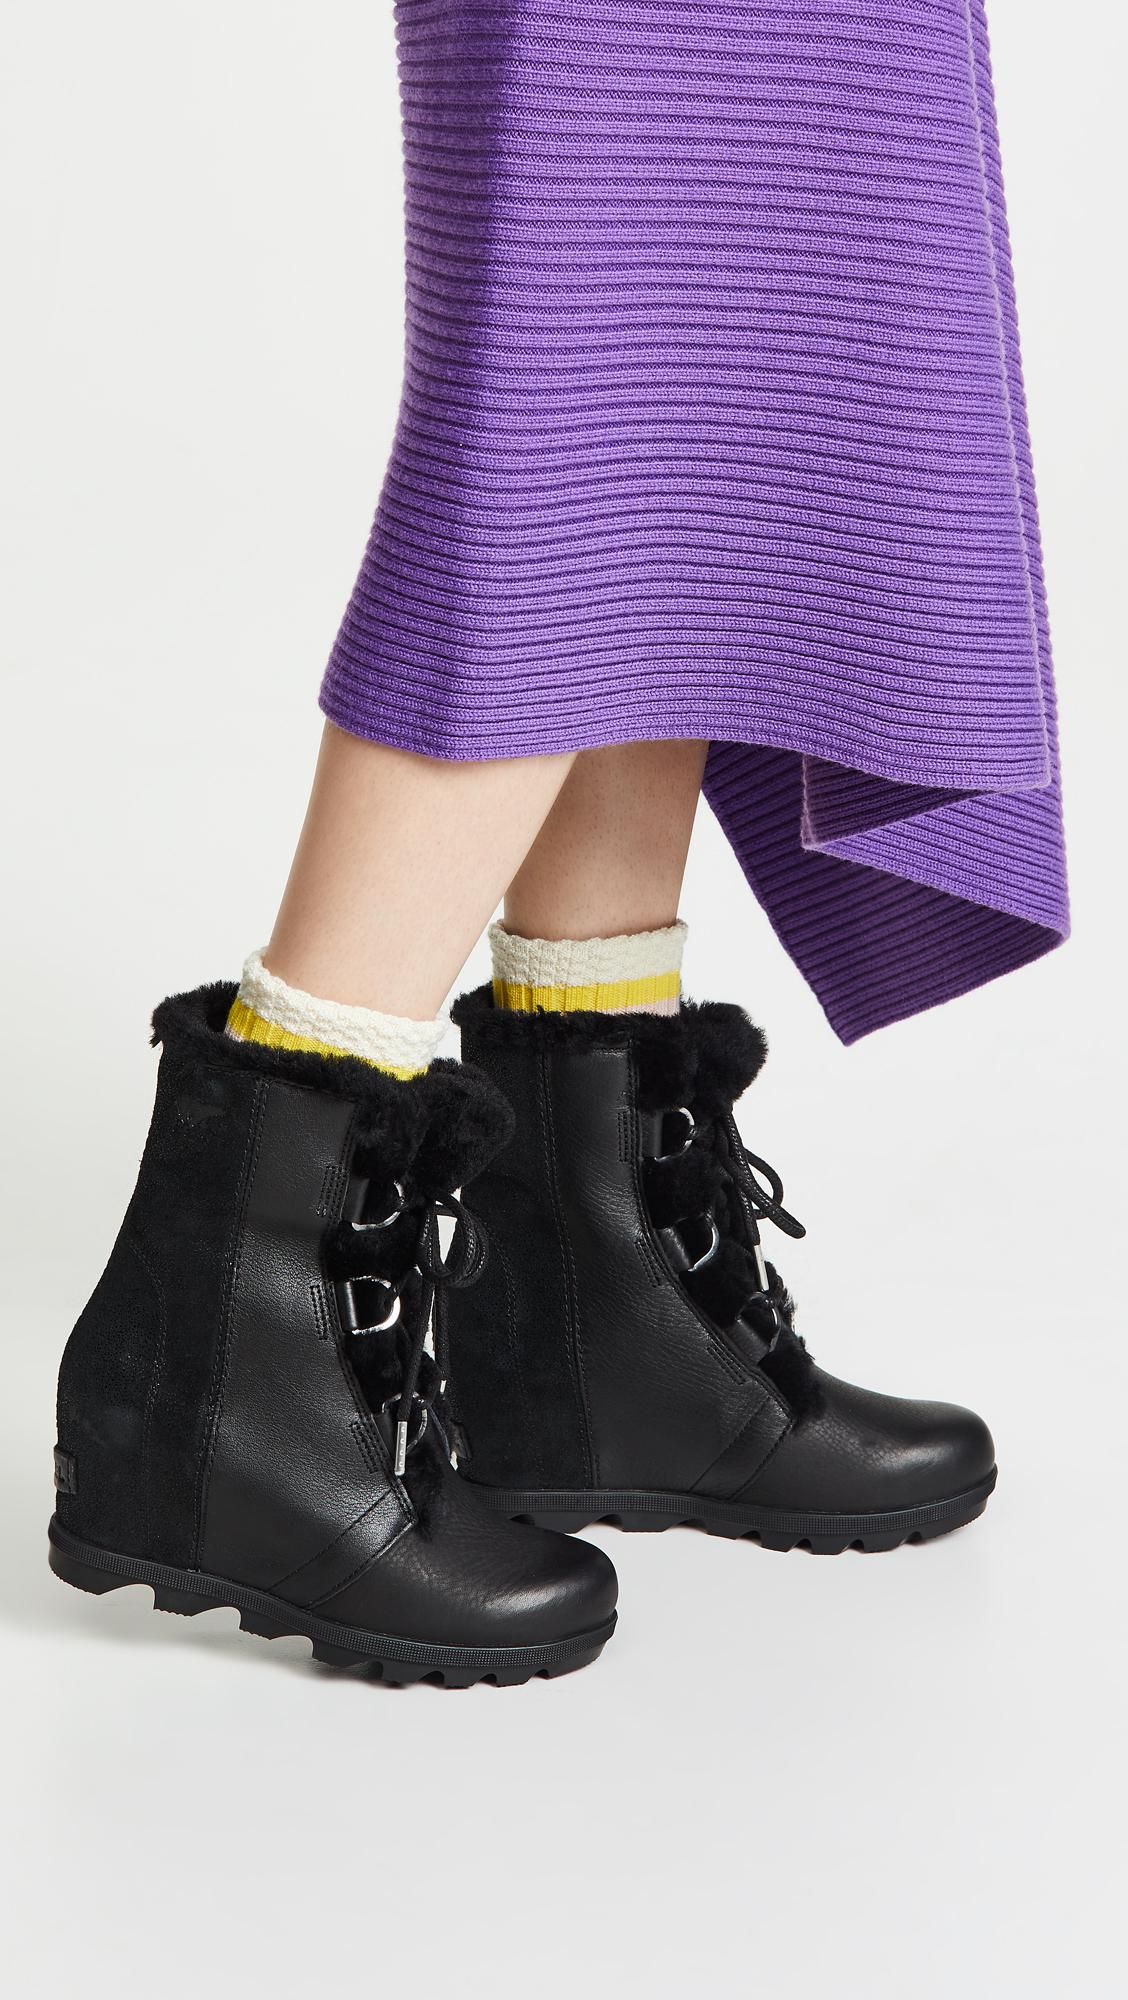 43844f31764 Sorel - Black Joan Of Arctic Wedge Ii Shearling Boots - Lyst. View  fullscreen